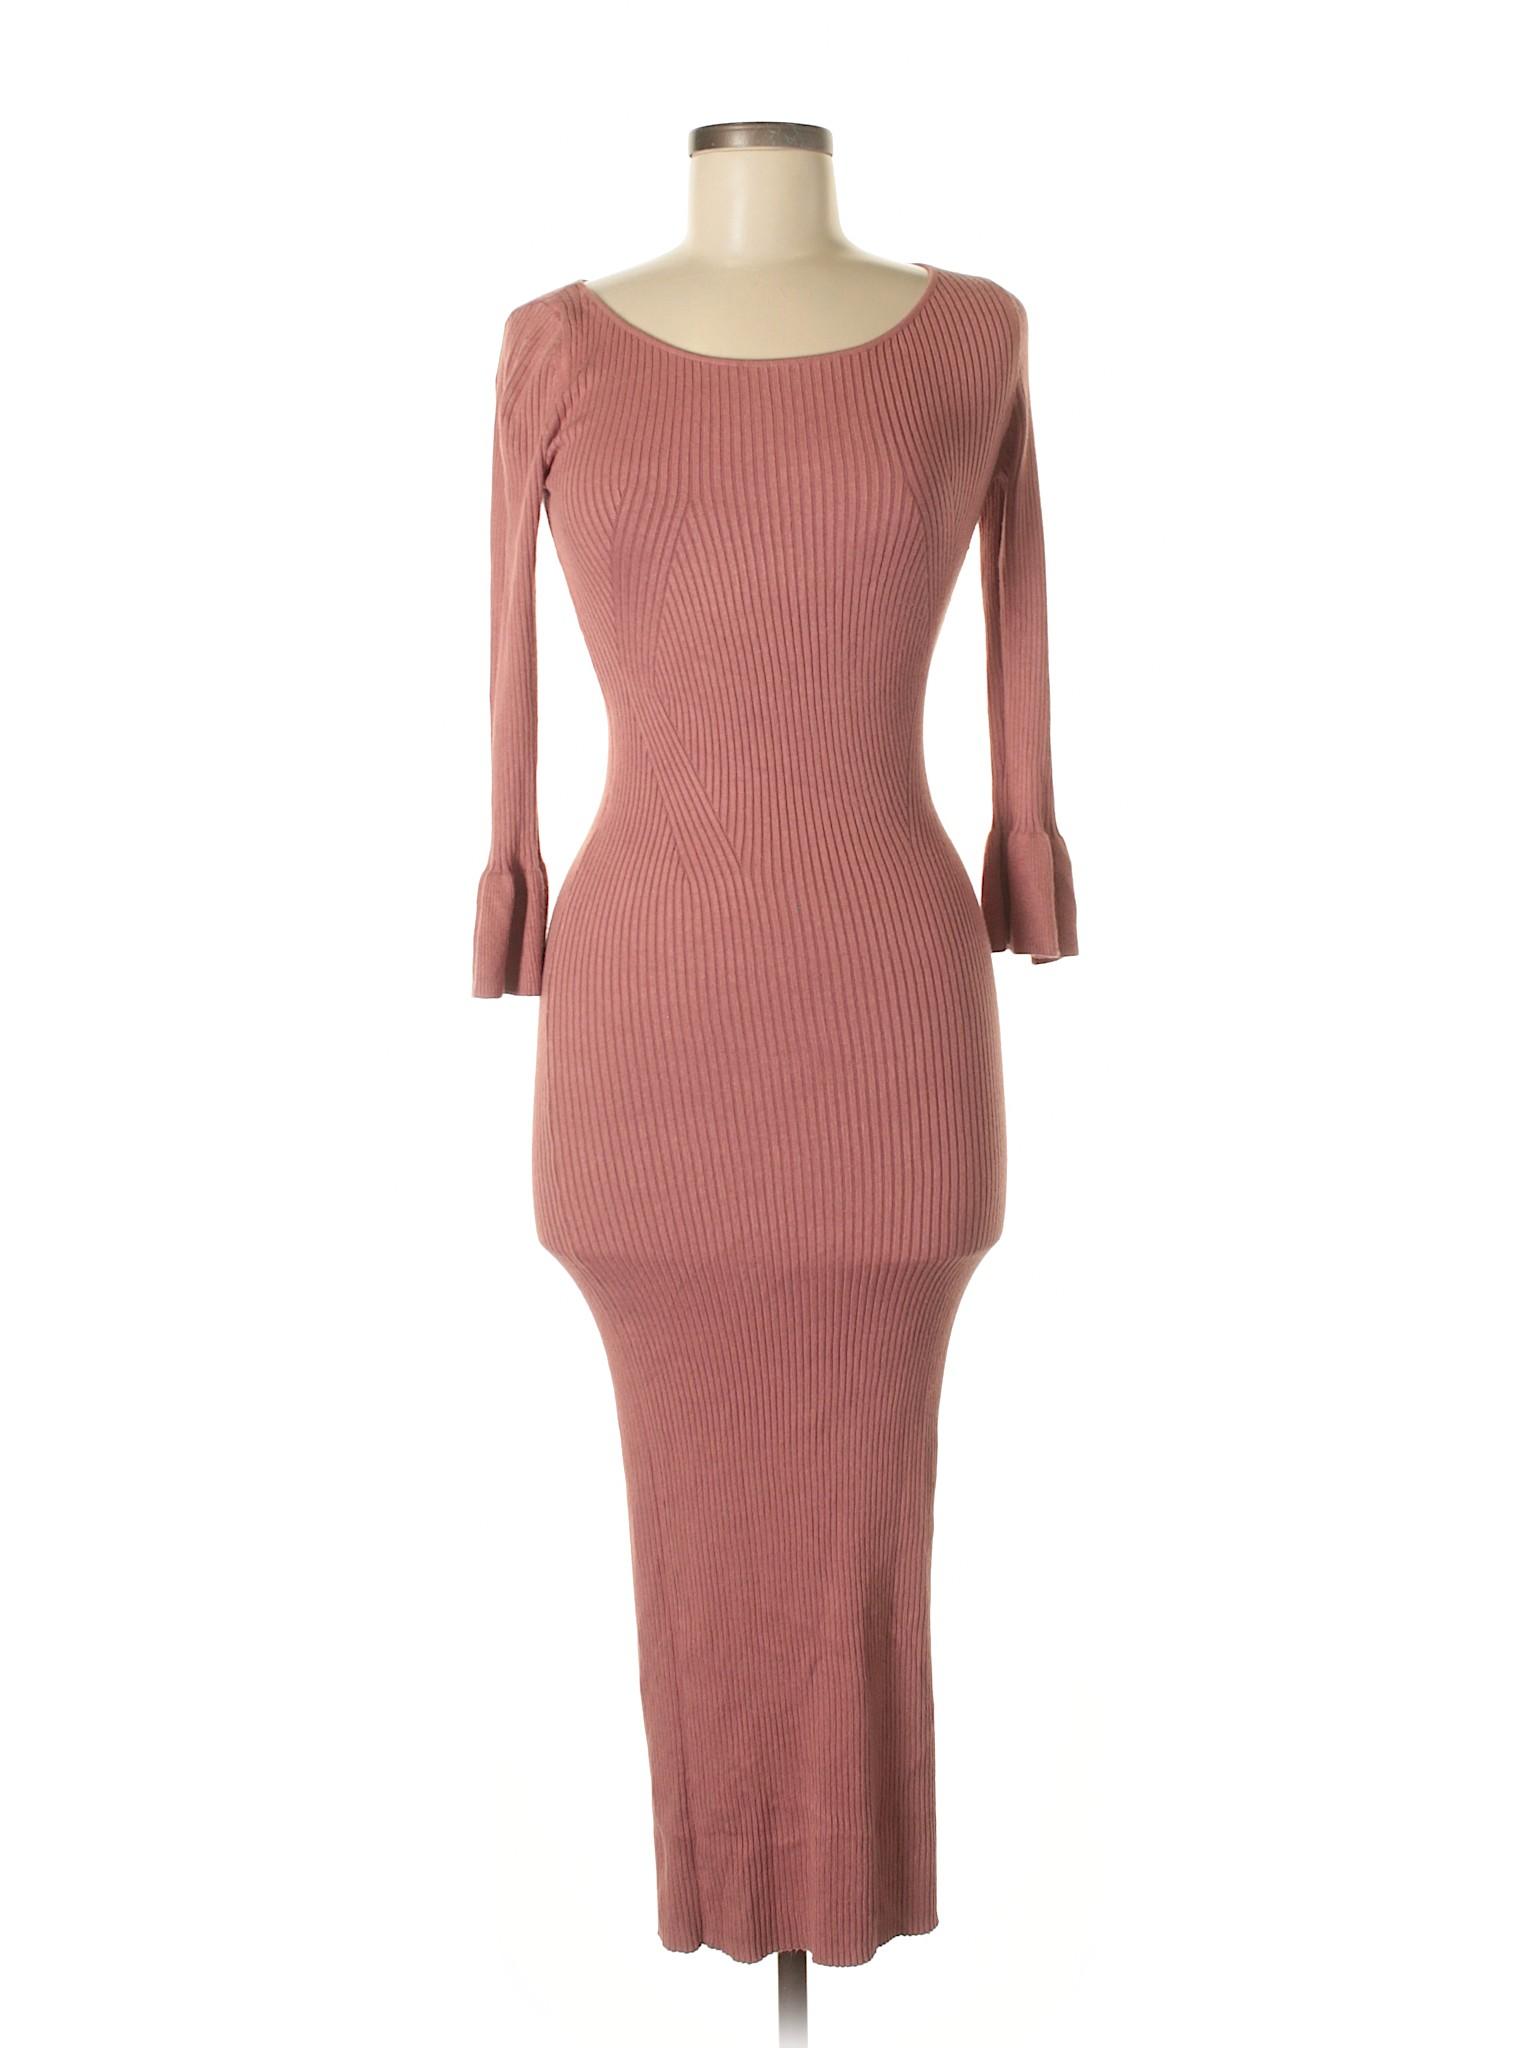 Selling Zara Casual Zara Casual Dress Dress Zara Selling Dress Selling Zara Selling Dress Casual Casual d7IxwCq